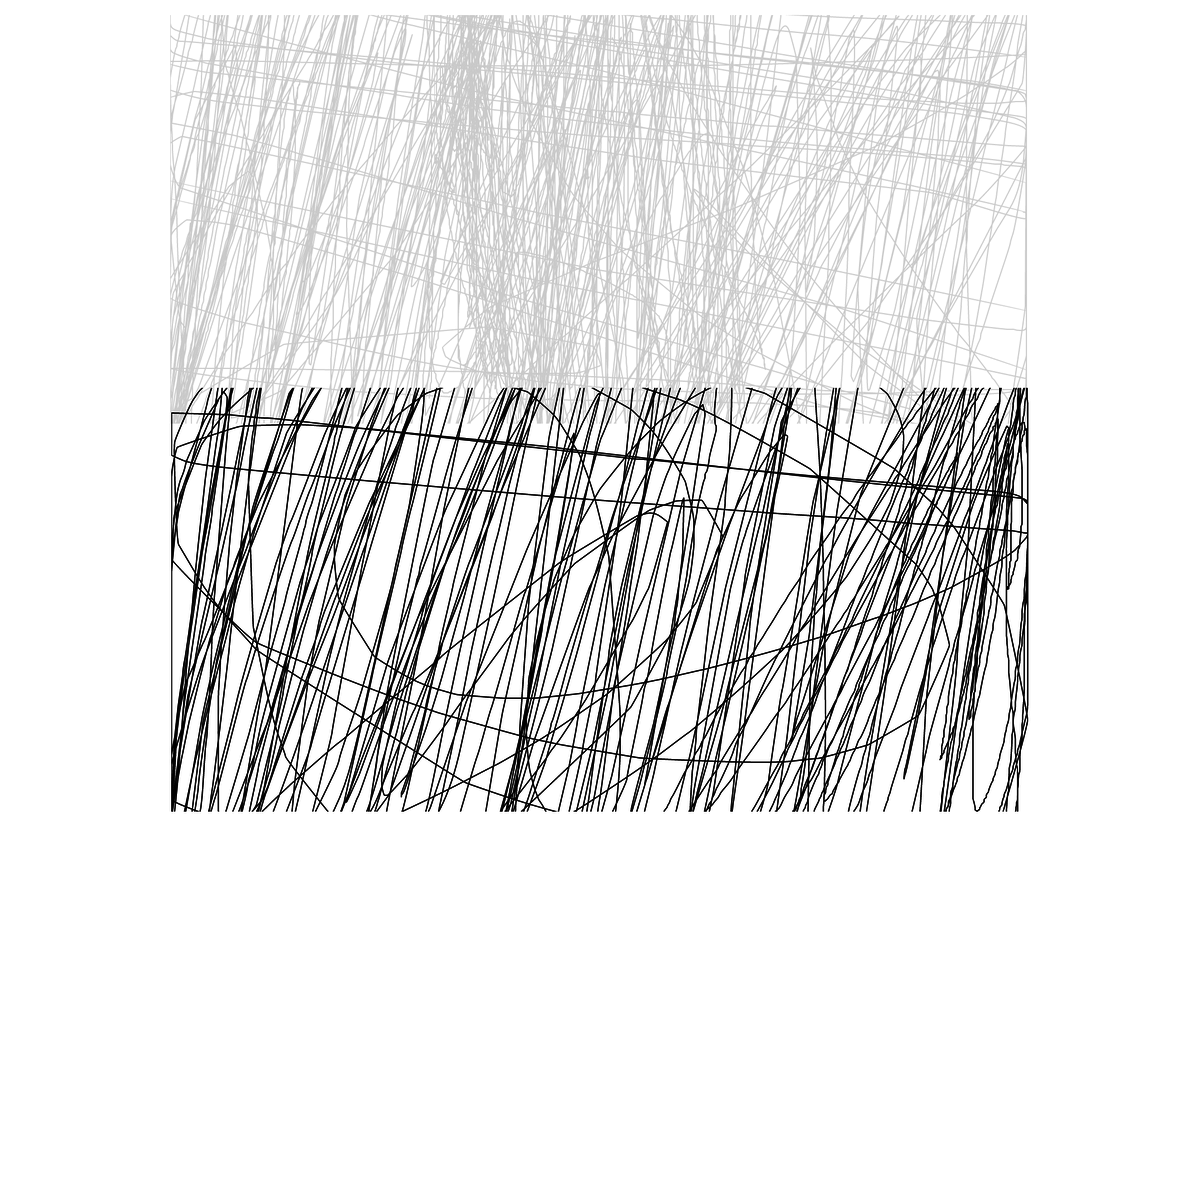 BAAAM drawing#23069 lat:52.4761276245117200lng: 13.4050378799438480